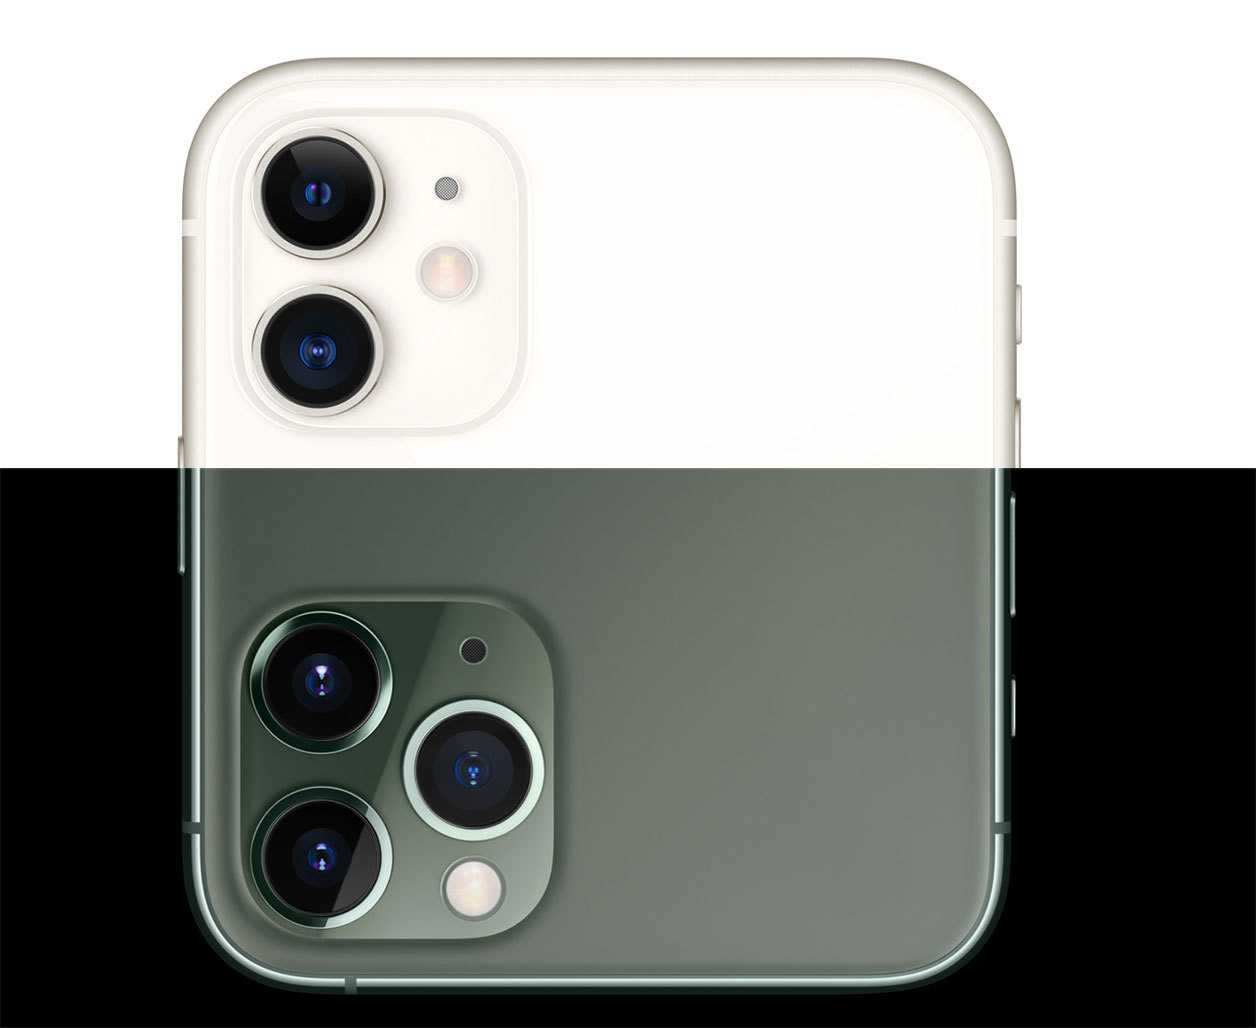 sao sanh iphone 11 va iphone 11 pro